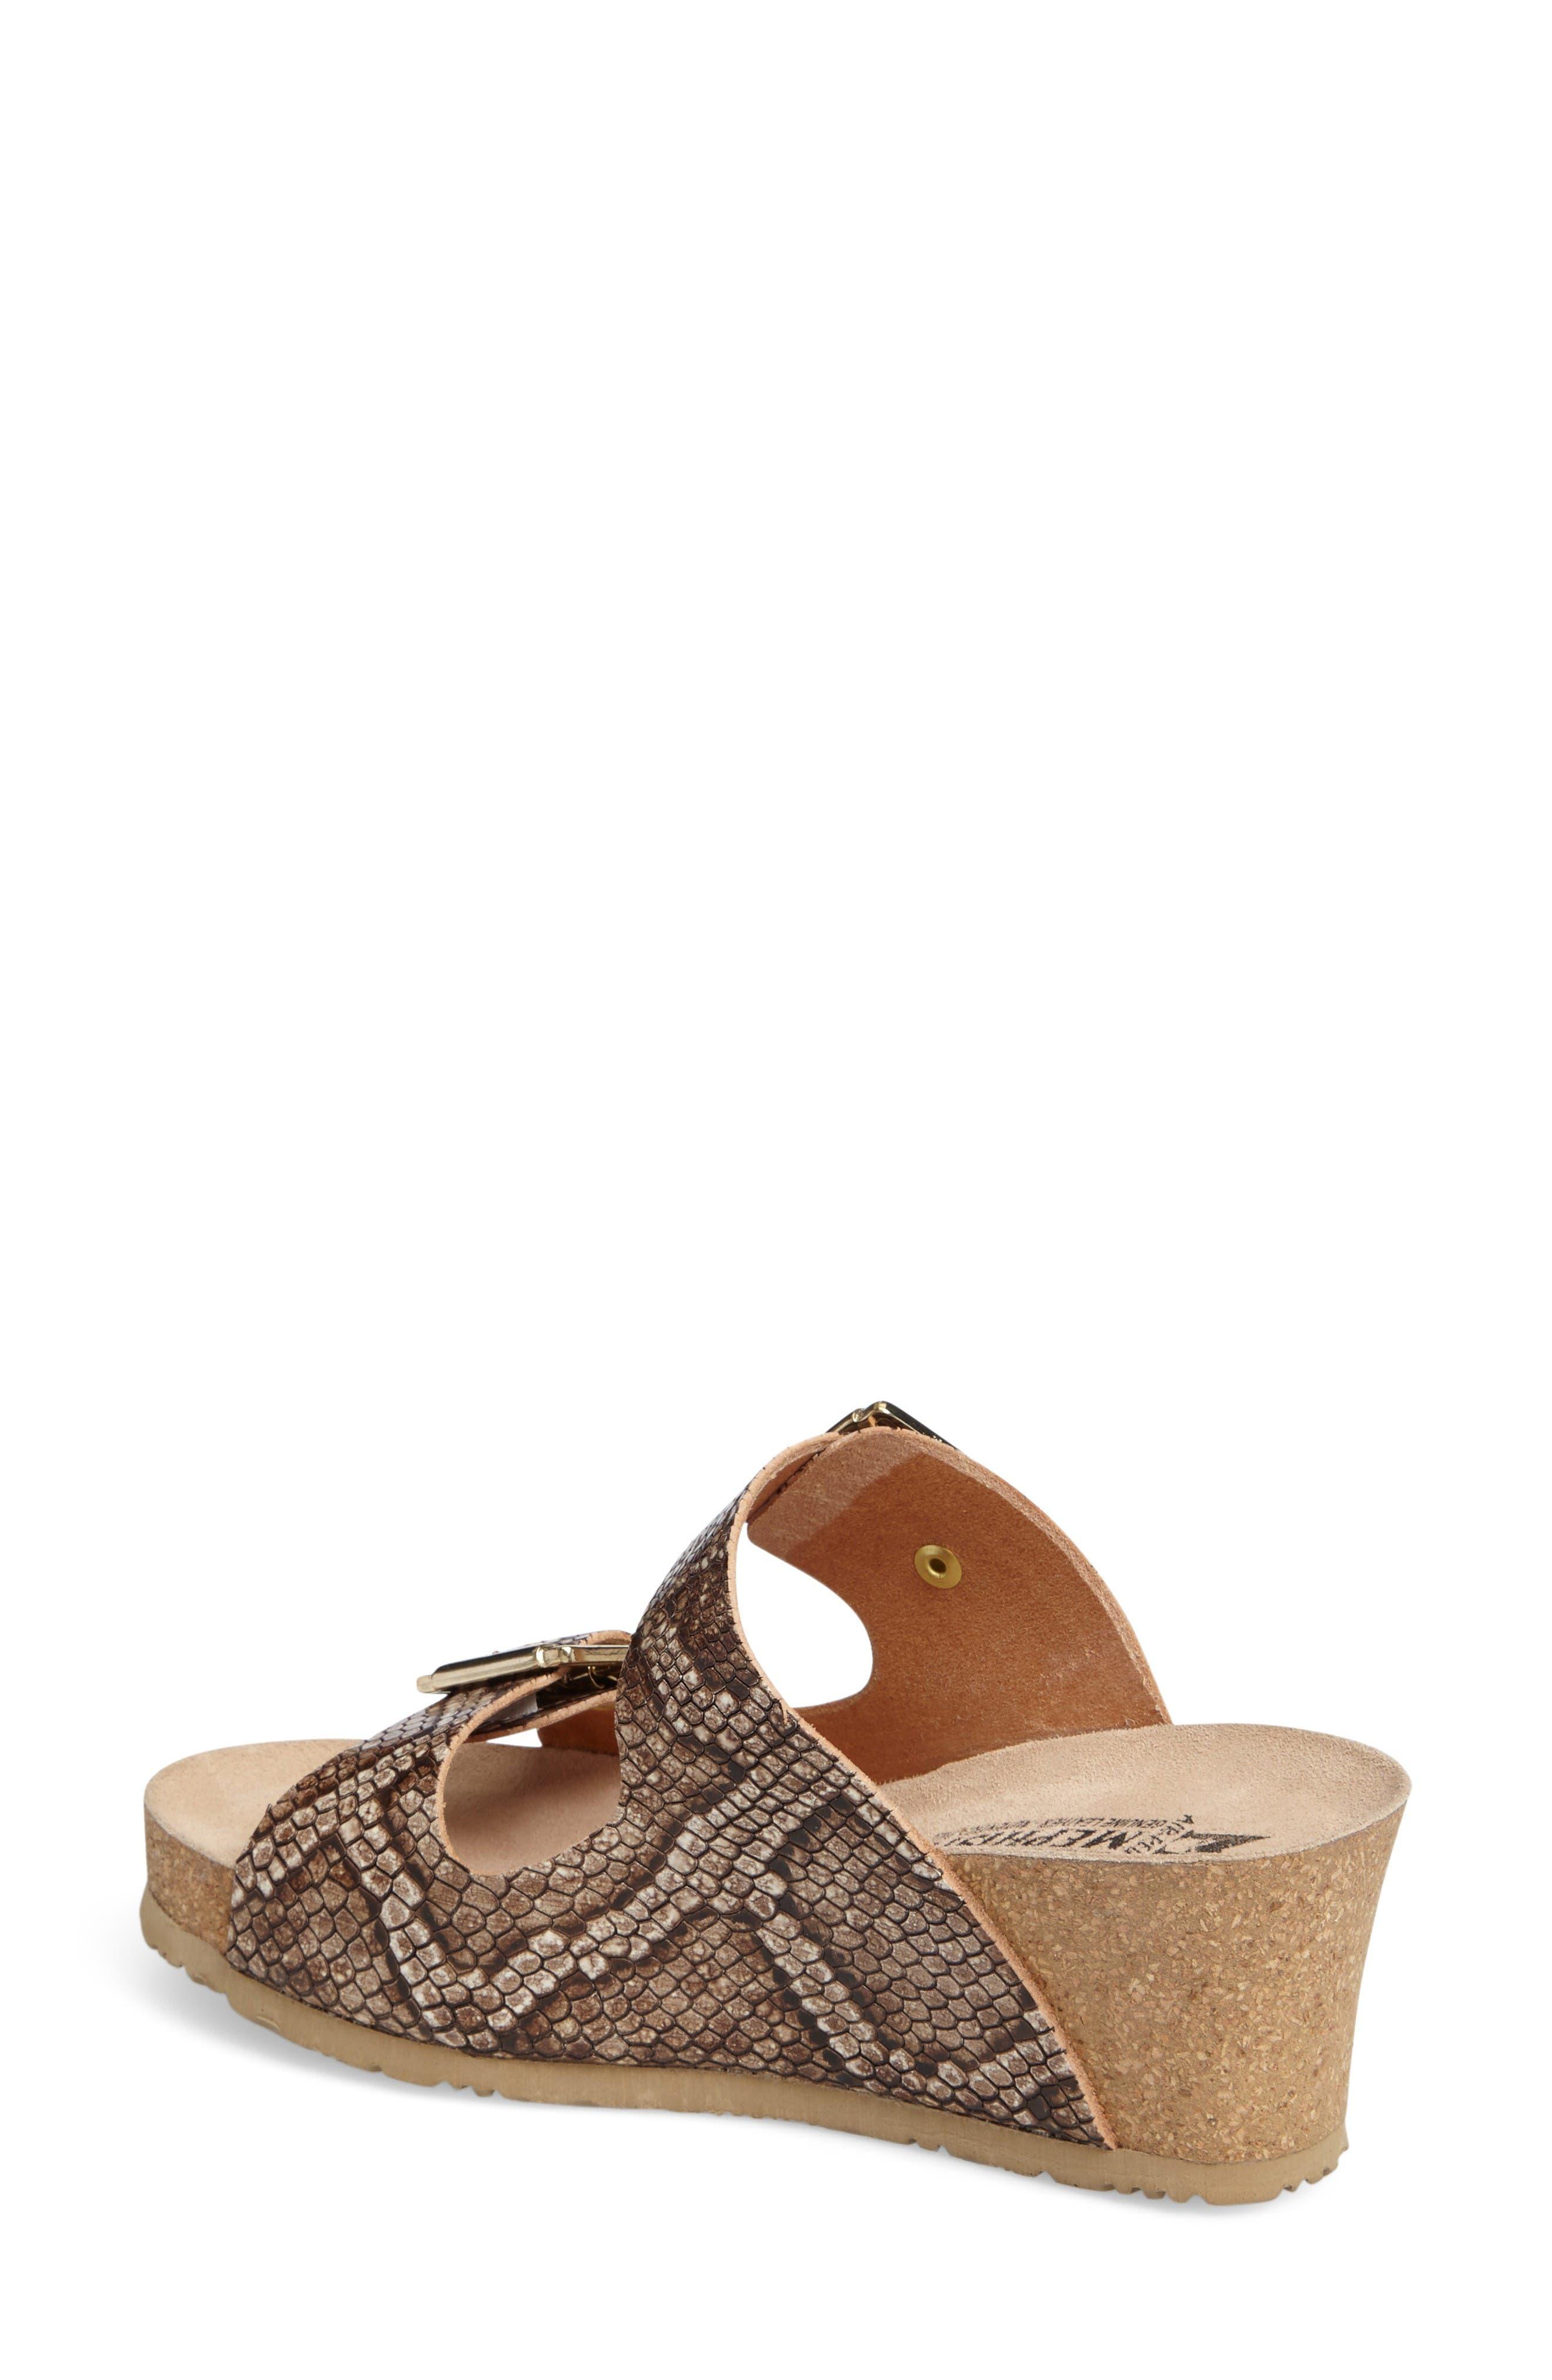 Lenia Wedge Sandal,                             Alternate thumbnail 2, color,                             Brown Leather